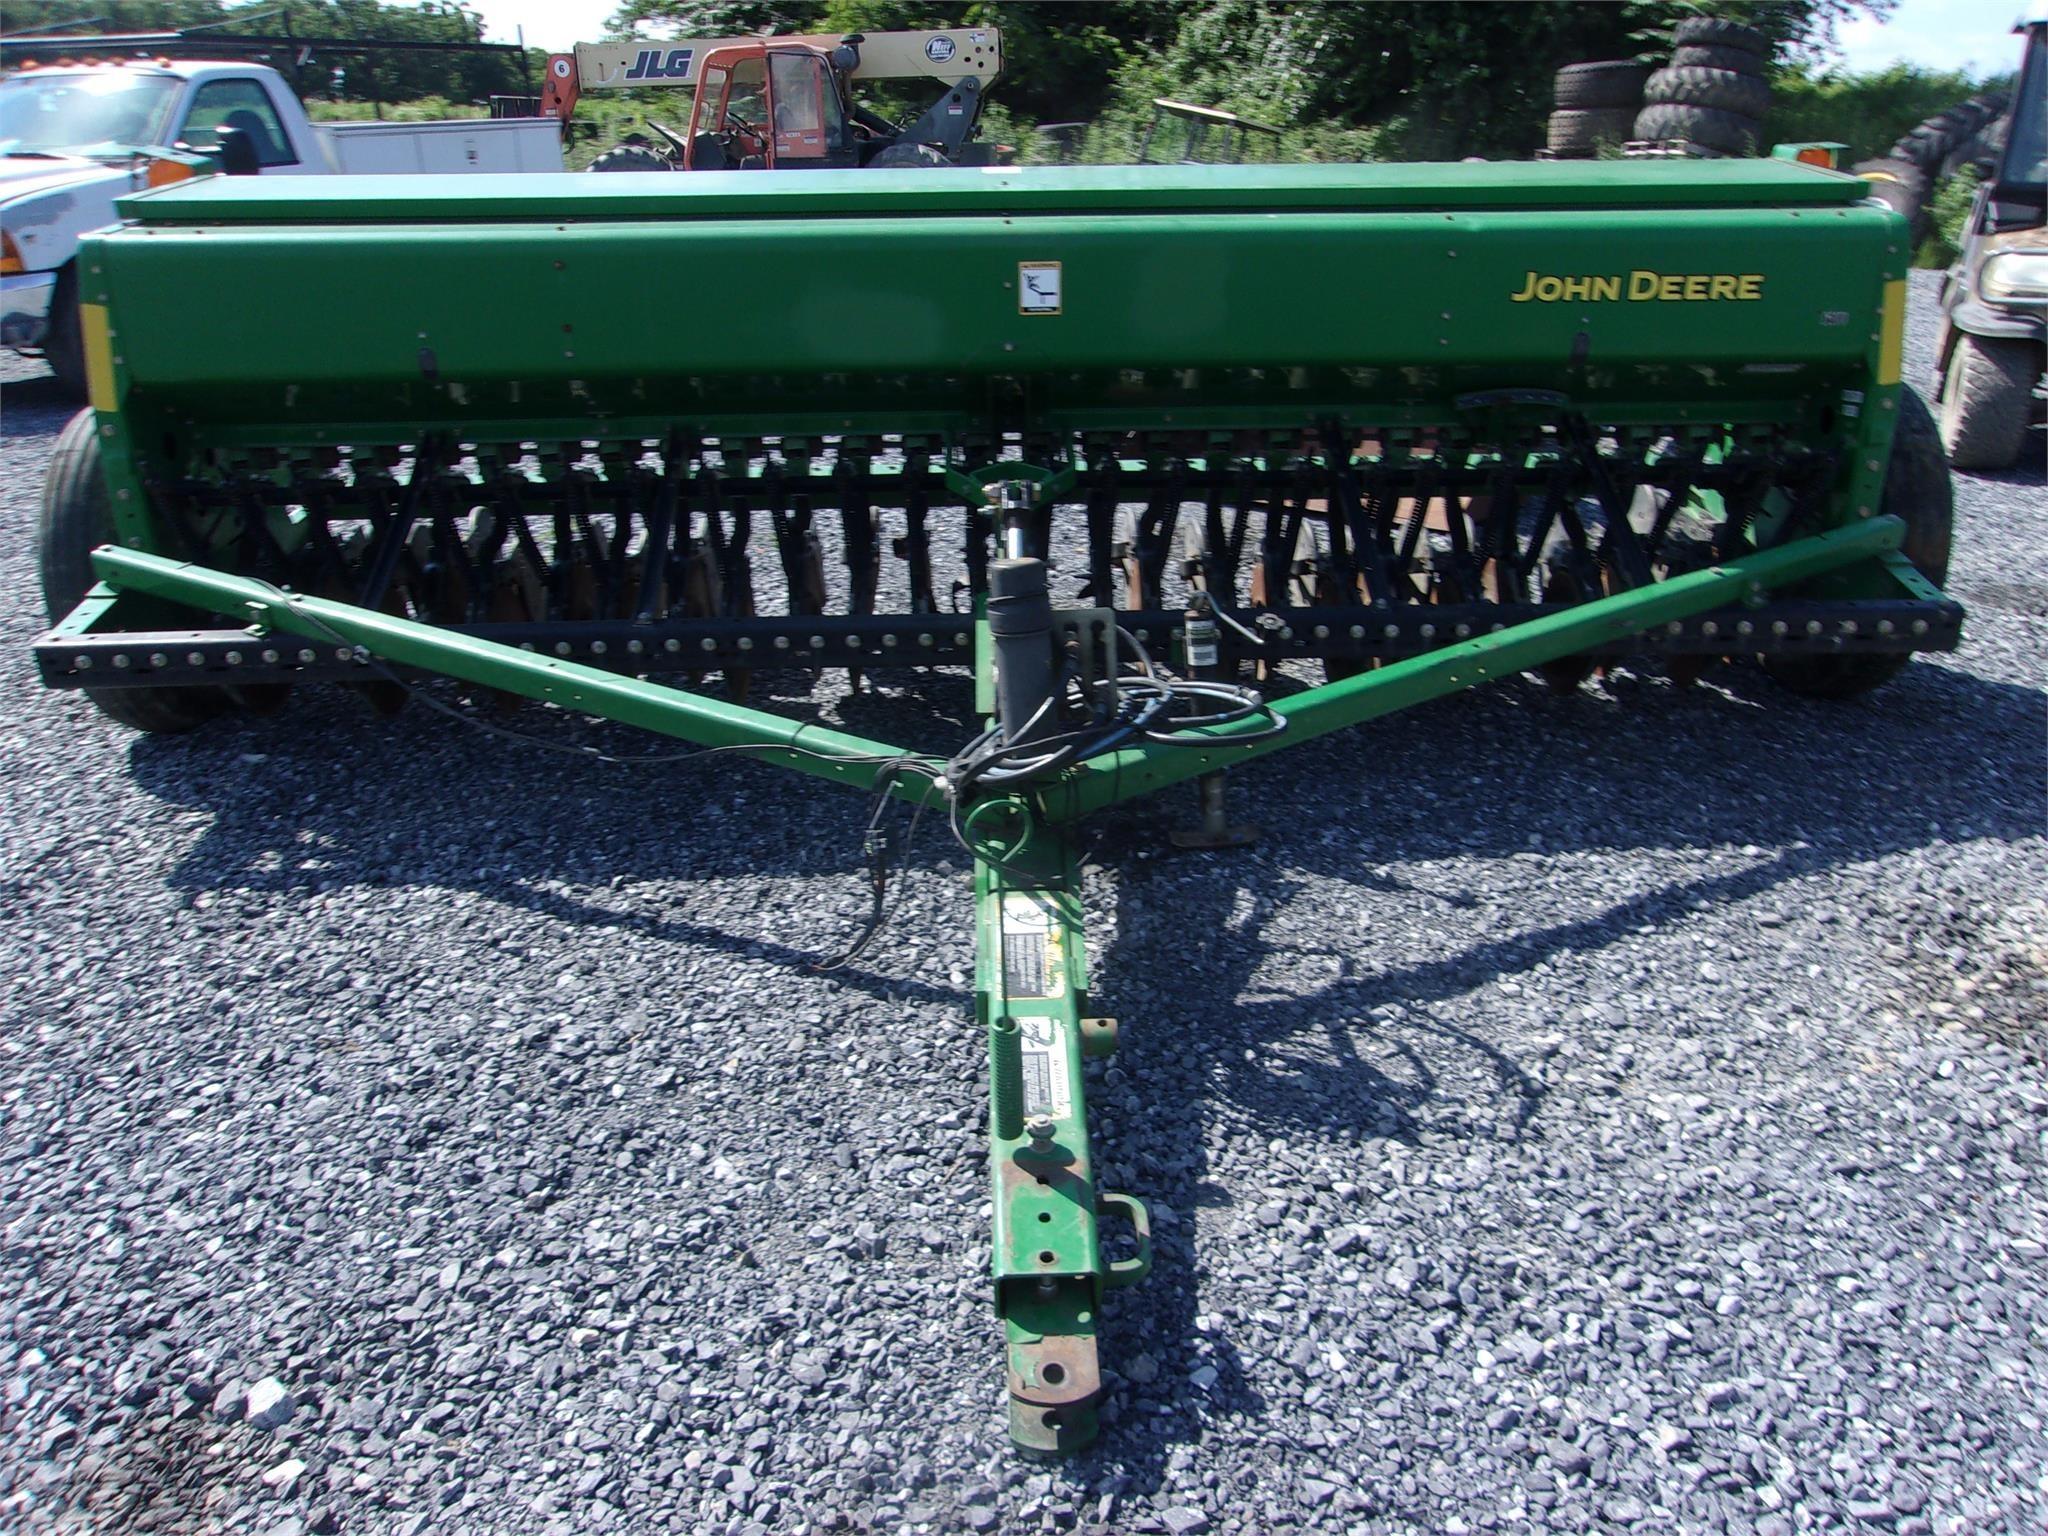 John Deere BD1113 Drill